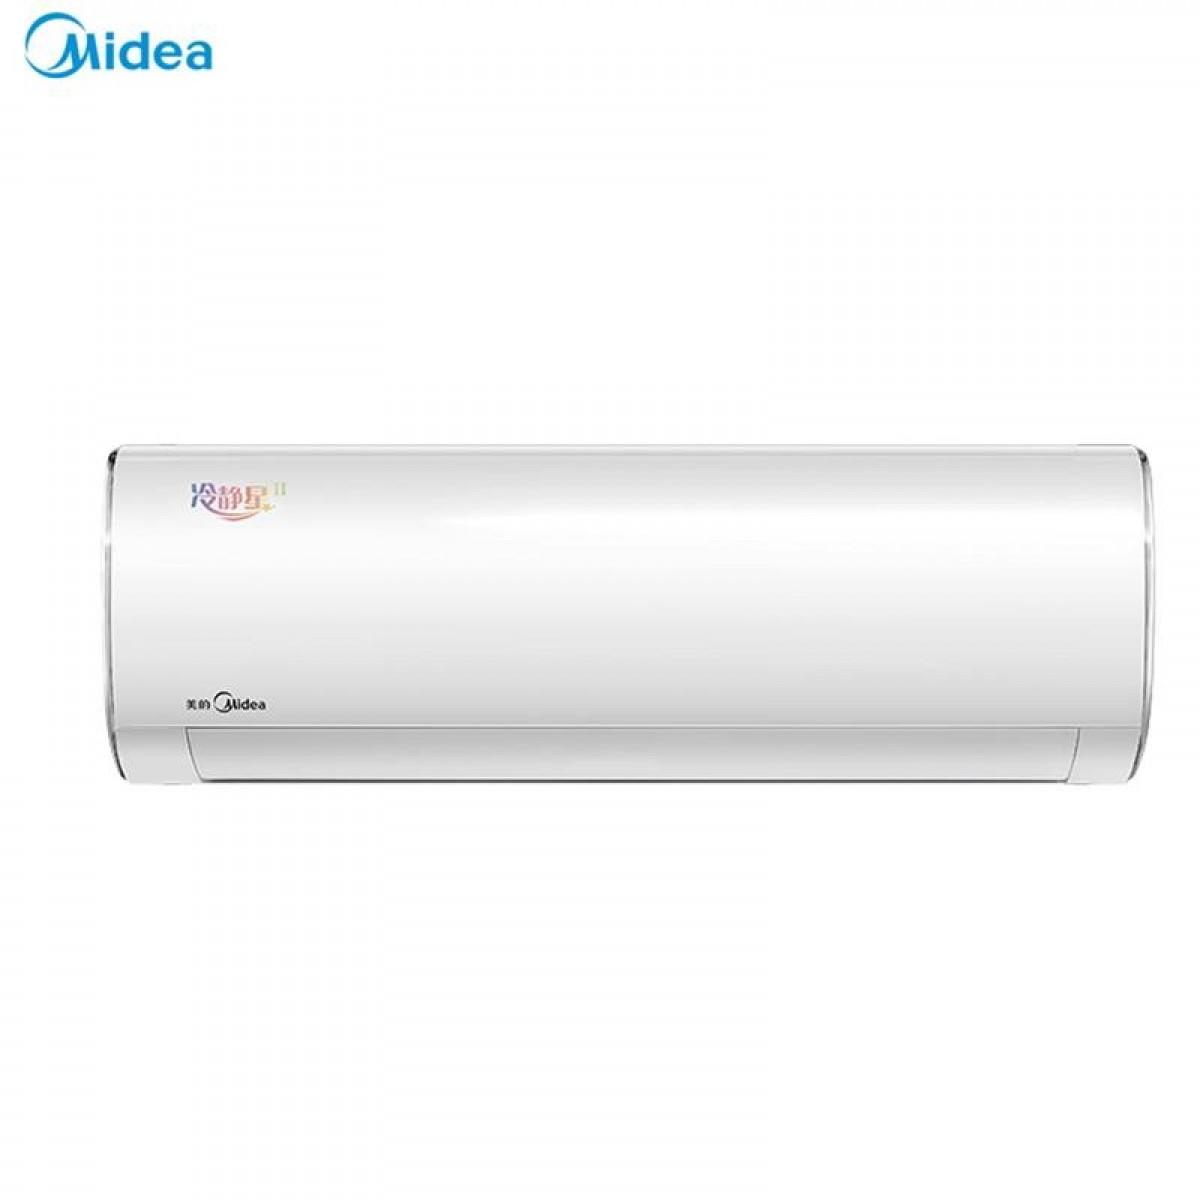 美的(Midea)壁挂式空调 KFR-72GW/BP3DN8Y-DA401(1)(3匹/变频冷暖/一级能效/220V)